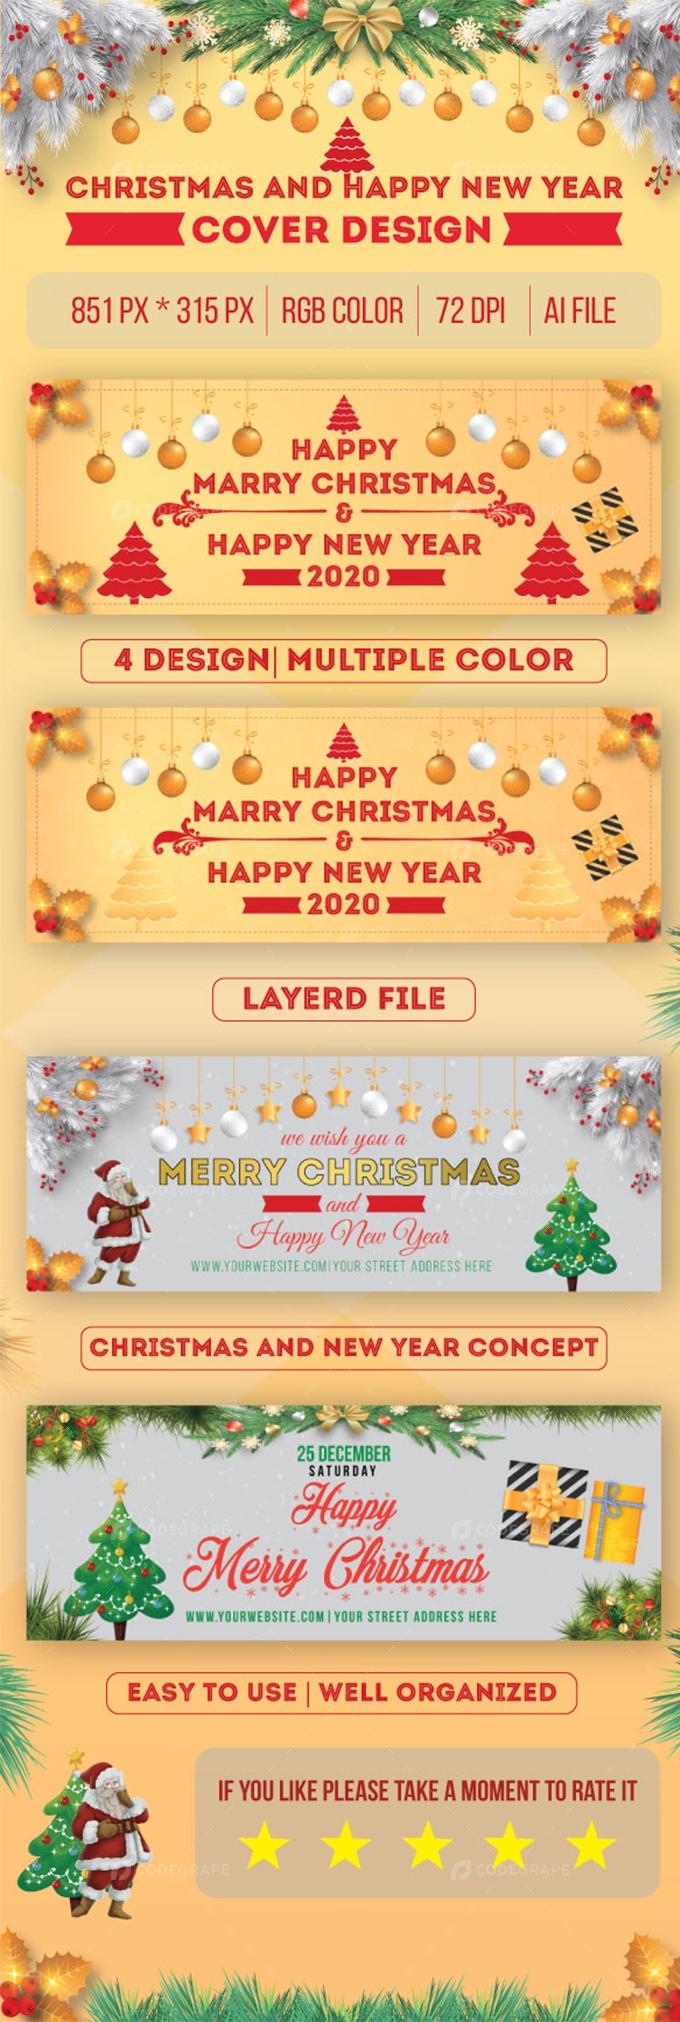 Christmas Facebook Cover 2020